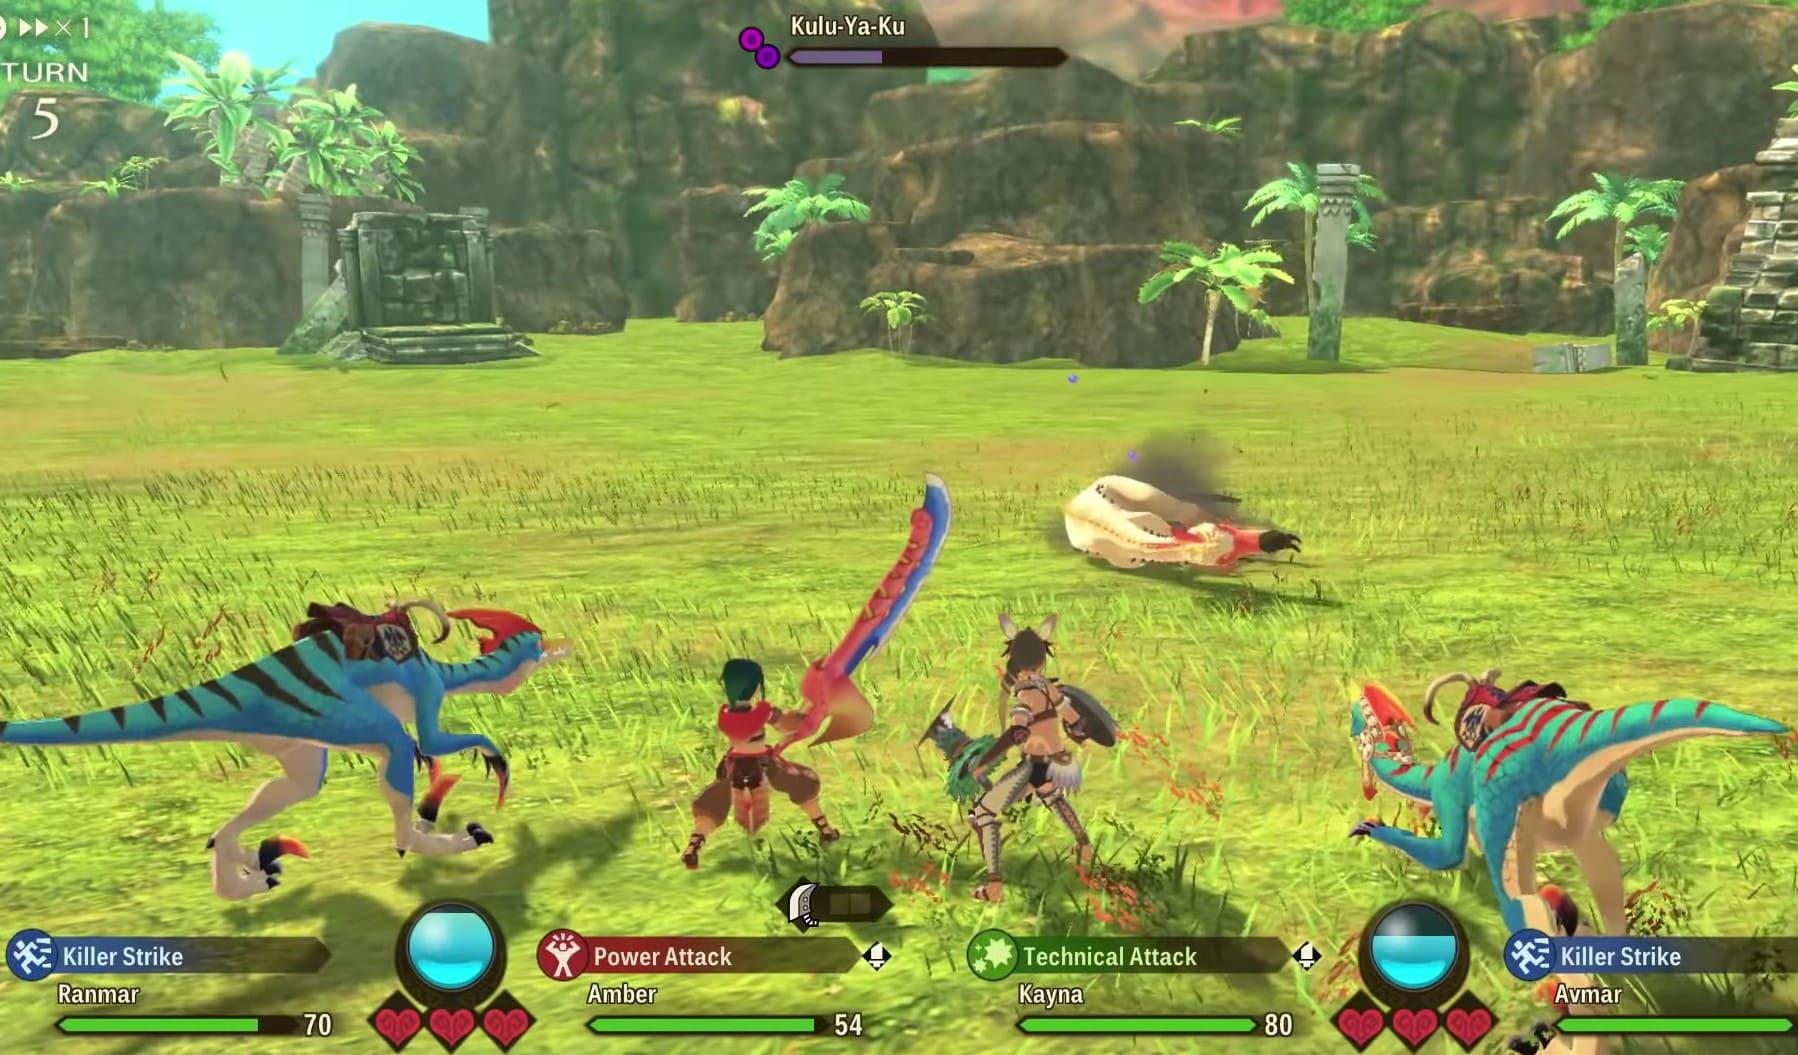 monster-hunter-combat-system